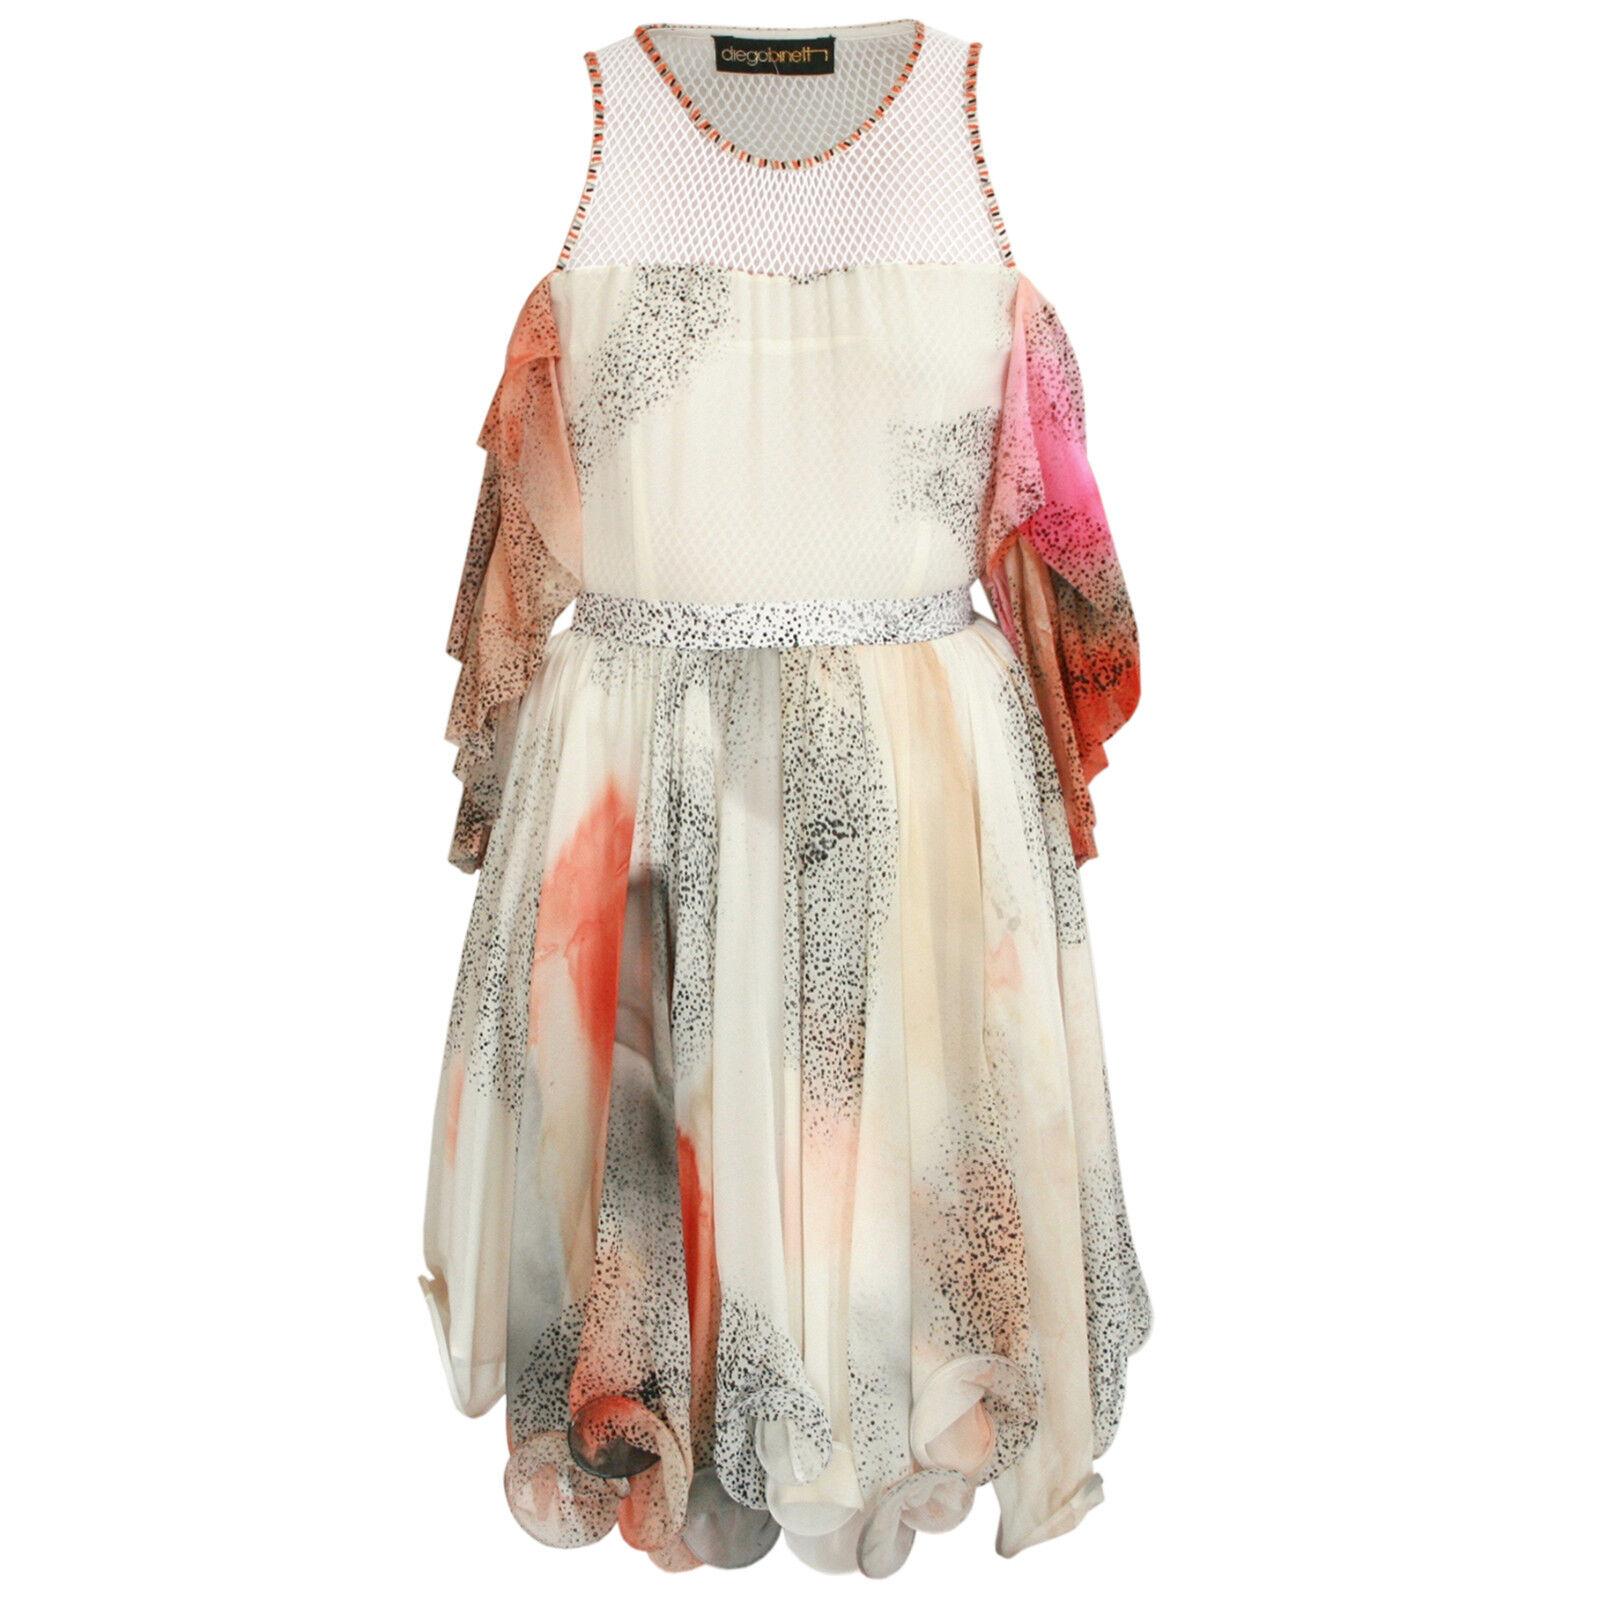 DIEGO BINETTI  1,650 beaded mesh pleated pleated pleated silk ruffled coral ivory dress 2 NEW 30e2ba